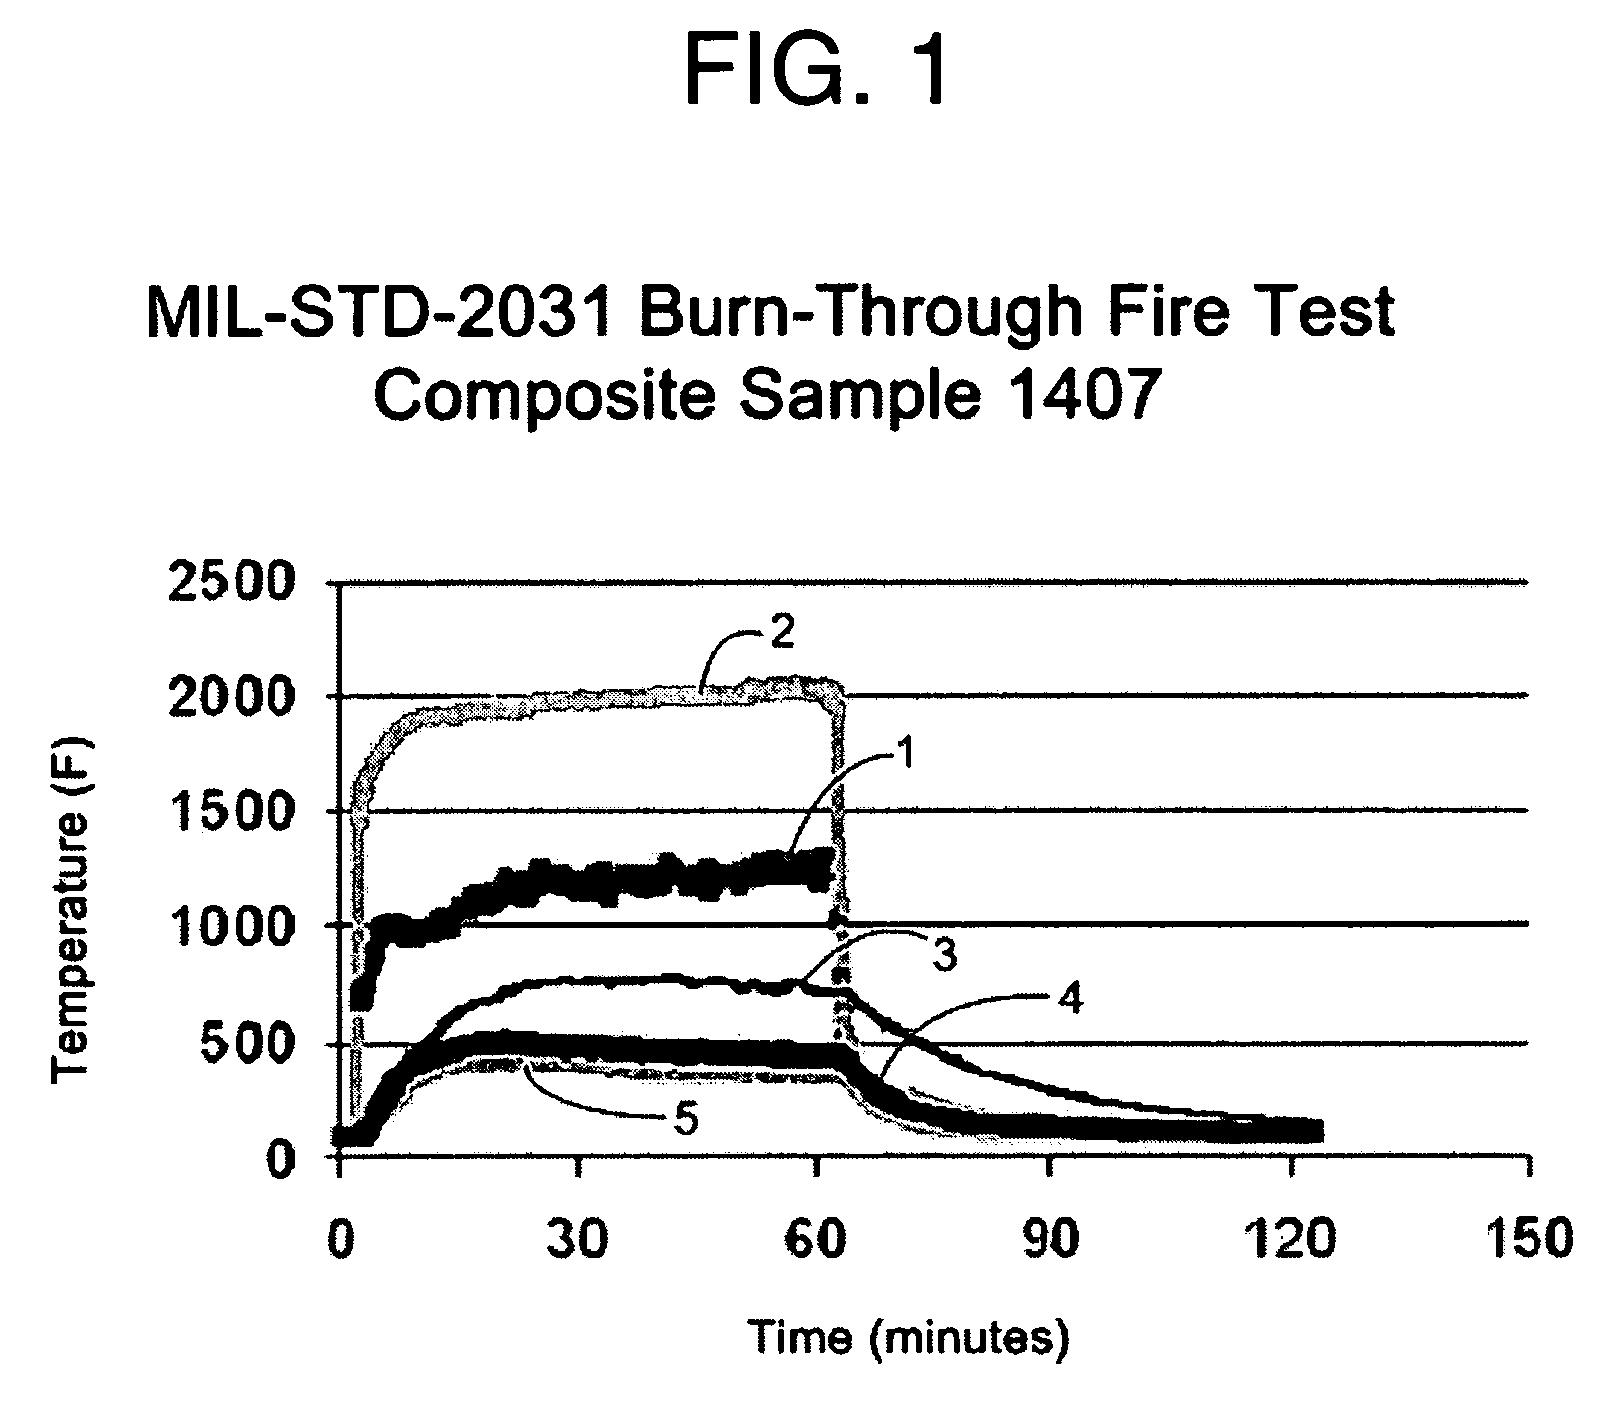 Fire Resistant Reinforcement : Patent us fire resistant structural composite